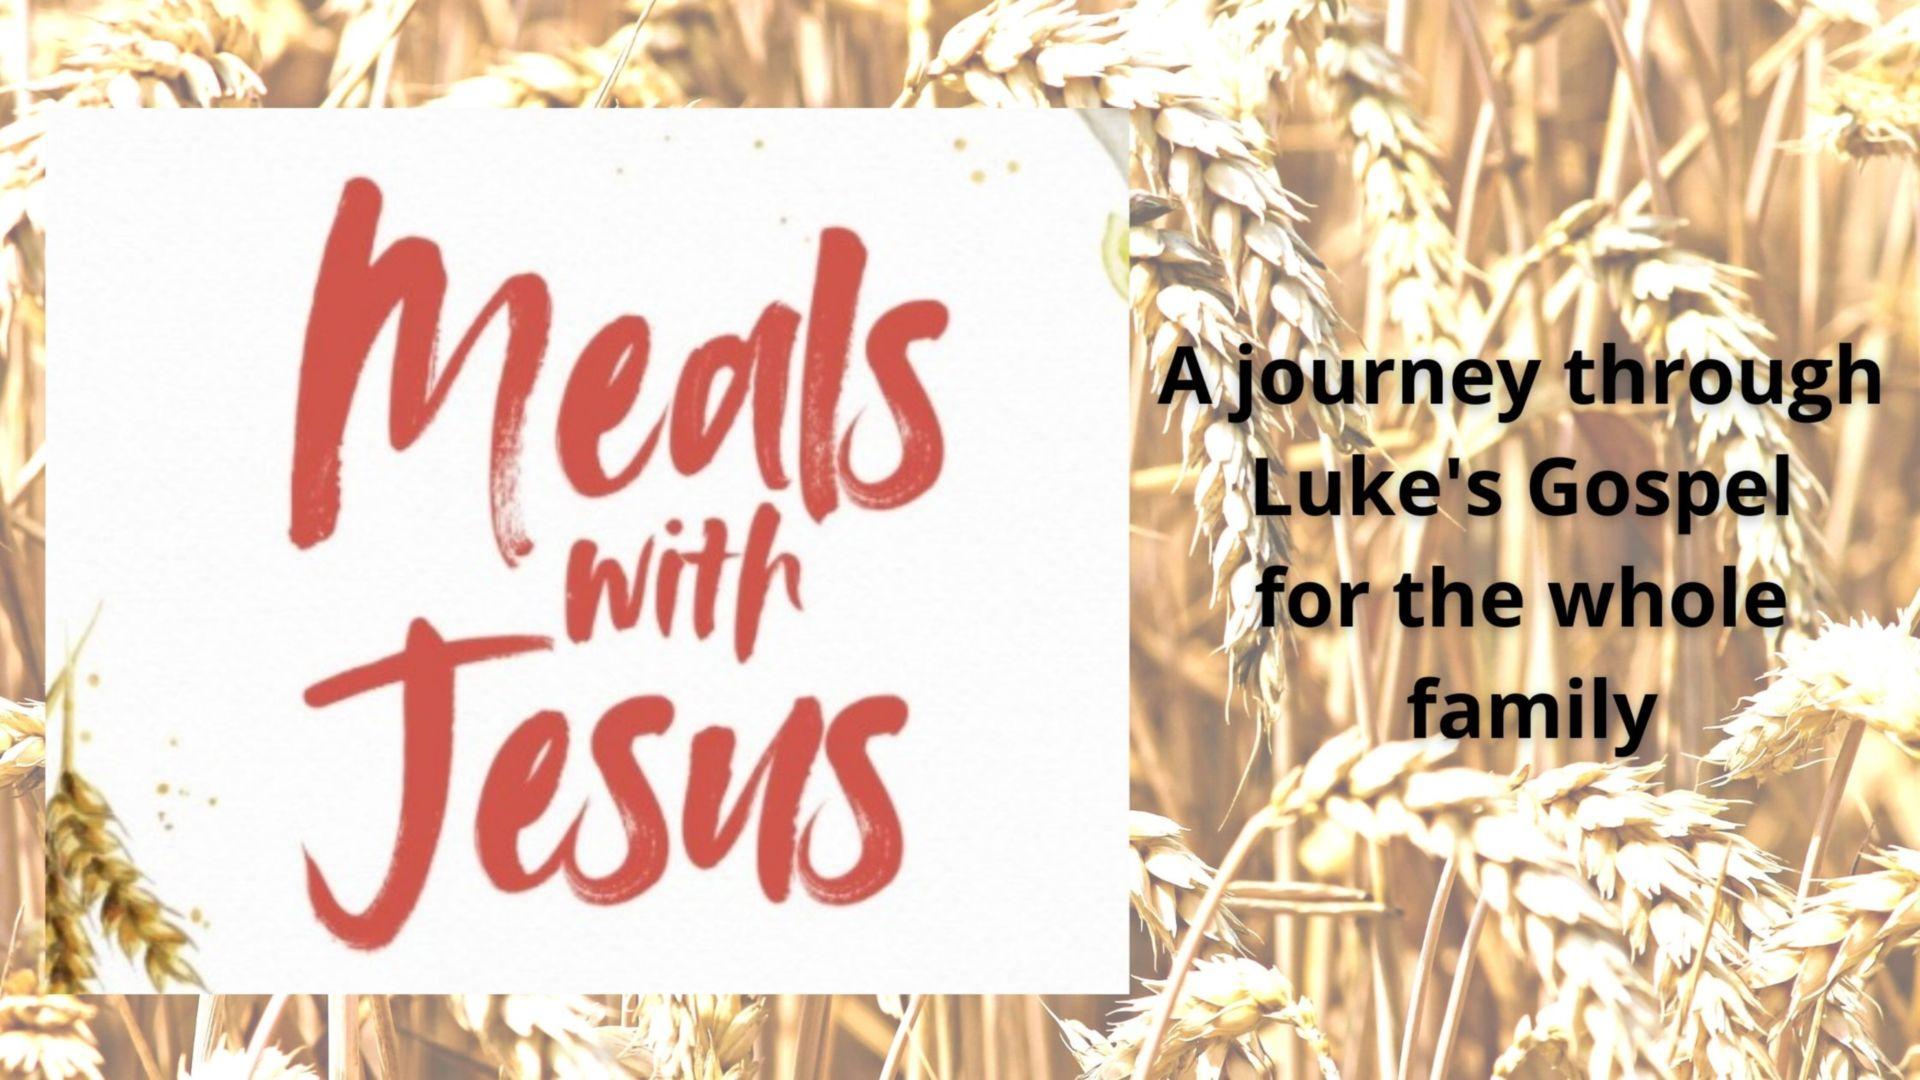 Meals with Jesus - A Family Devotional by Ed Drew